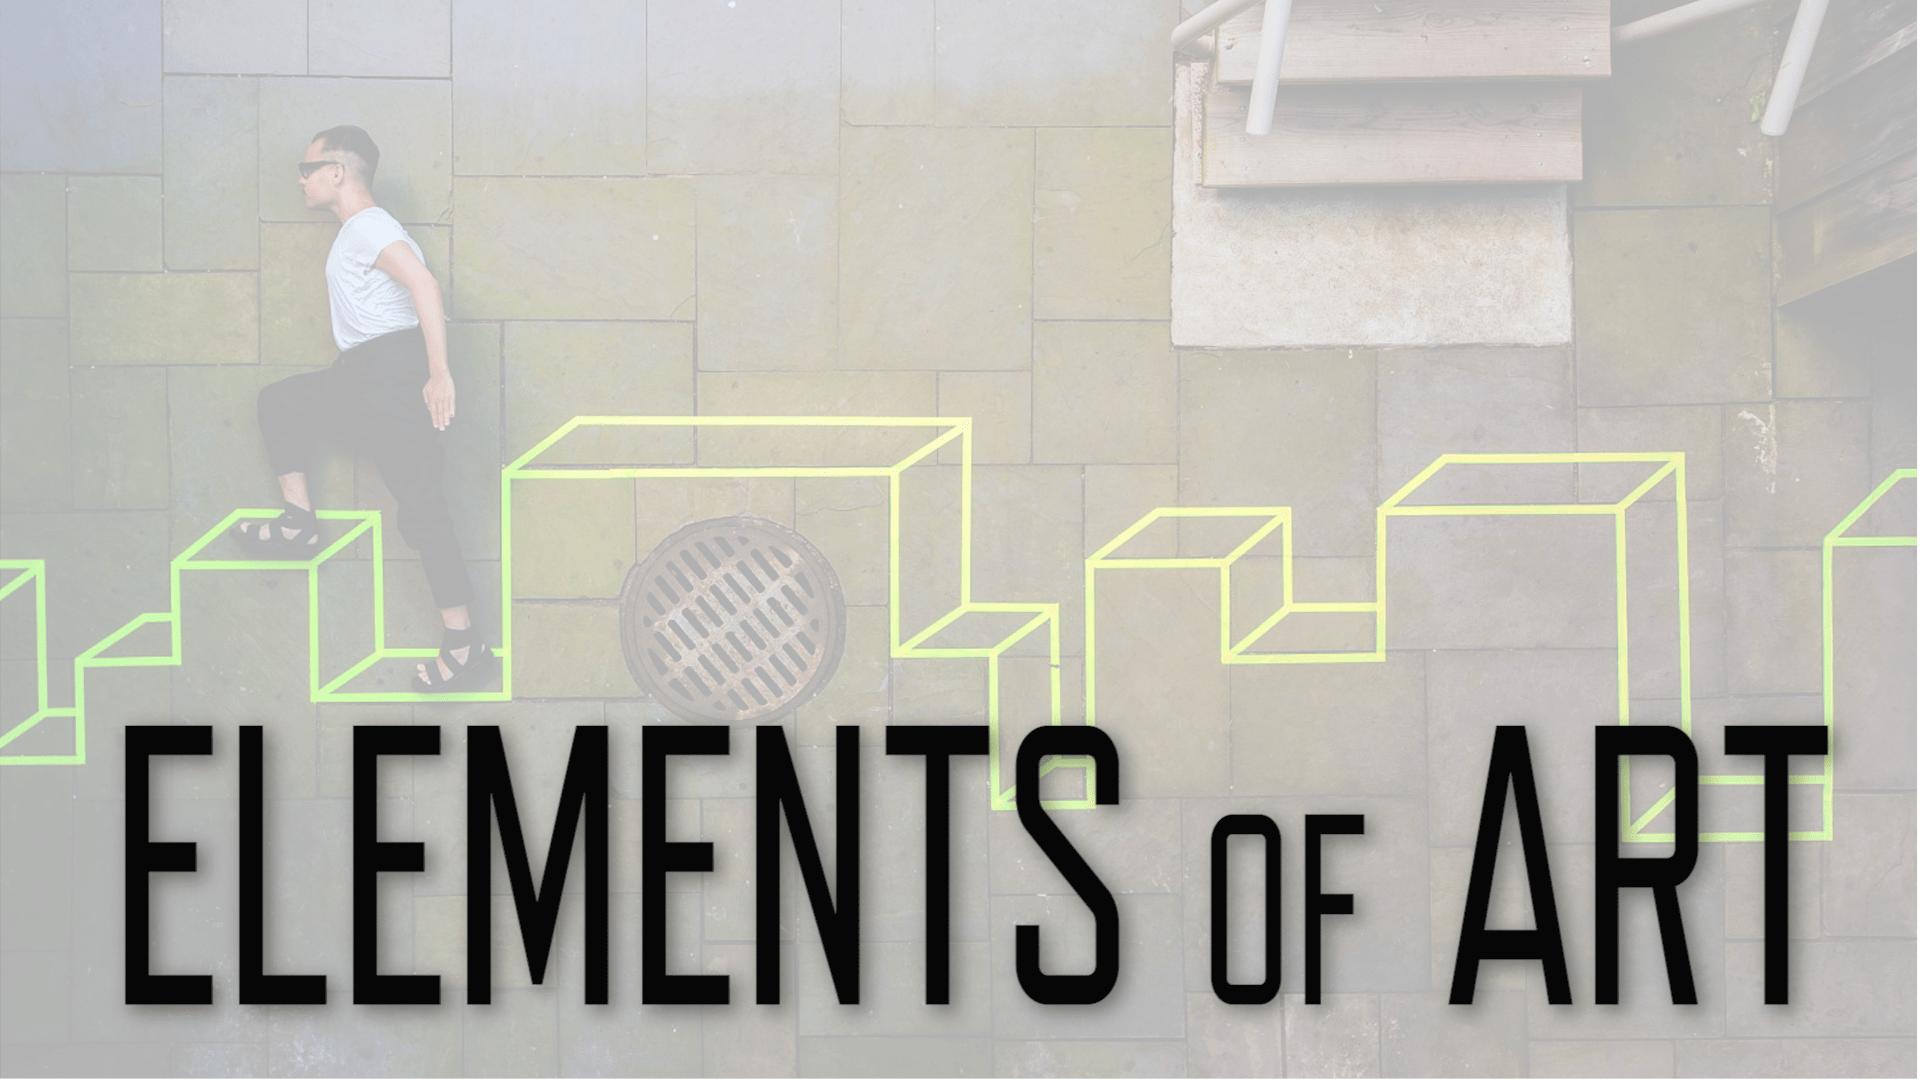 hight resolution of Elements of Art   KQED Art School   PBS LearningMedia